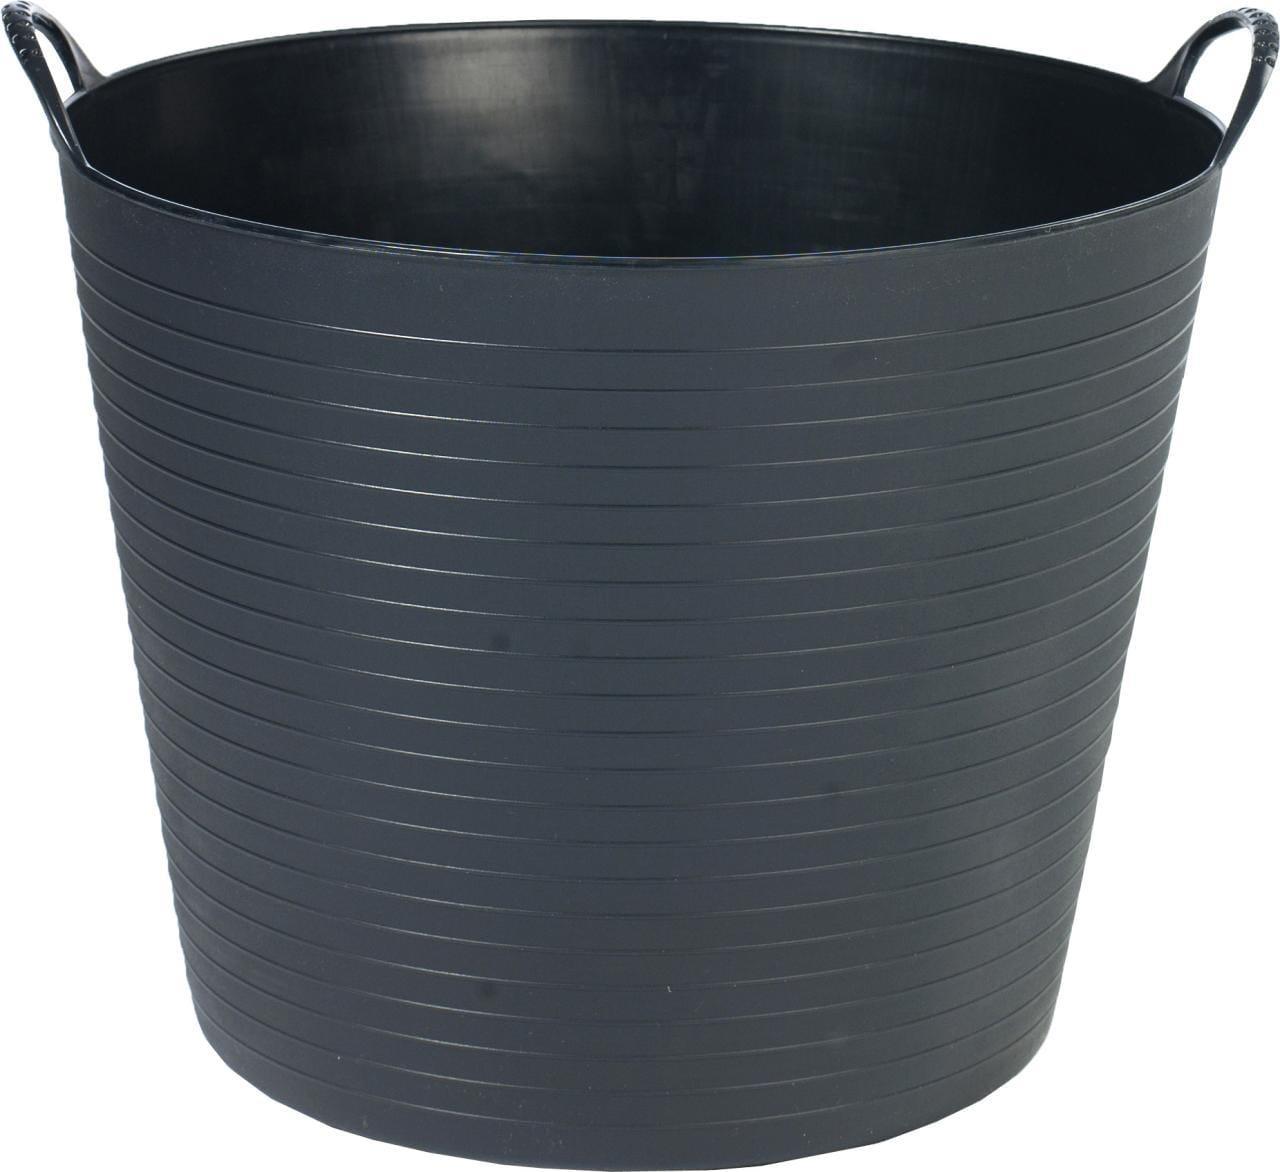 Bøtte, myk, fleksibel, 30 liter